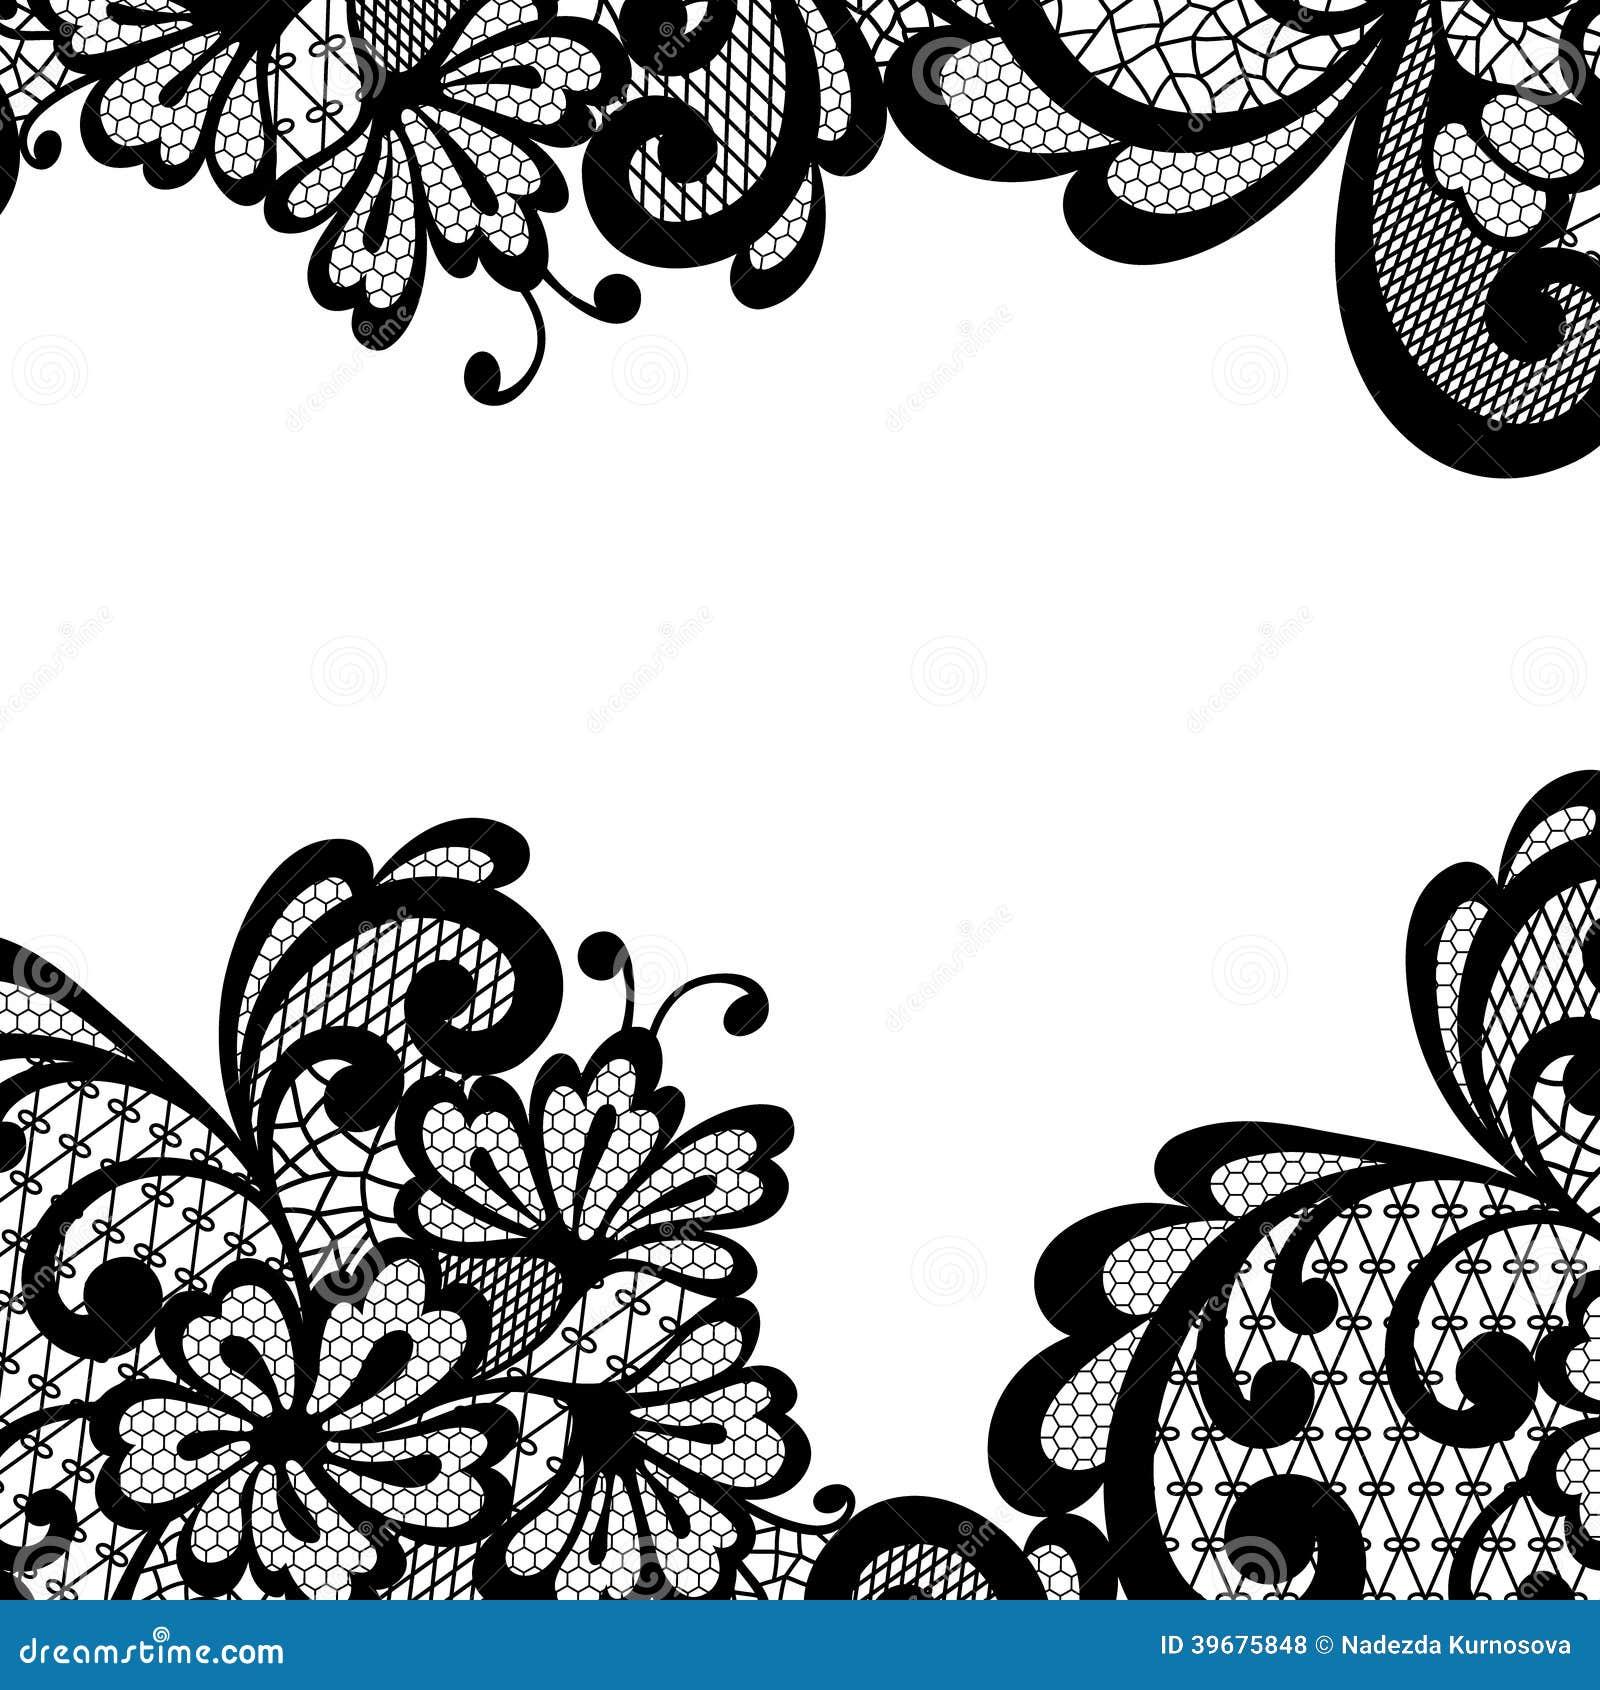 black vector lace corner stock illustrations – 789 black vector lace corner  stock illustrations, vectors & clipart - dreamstime  dreamstime.com